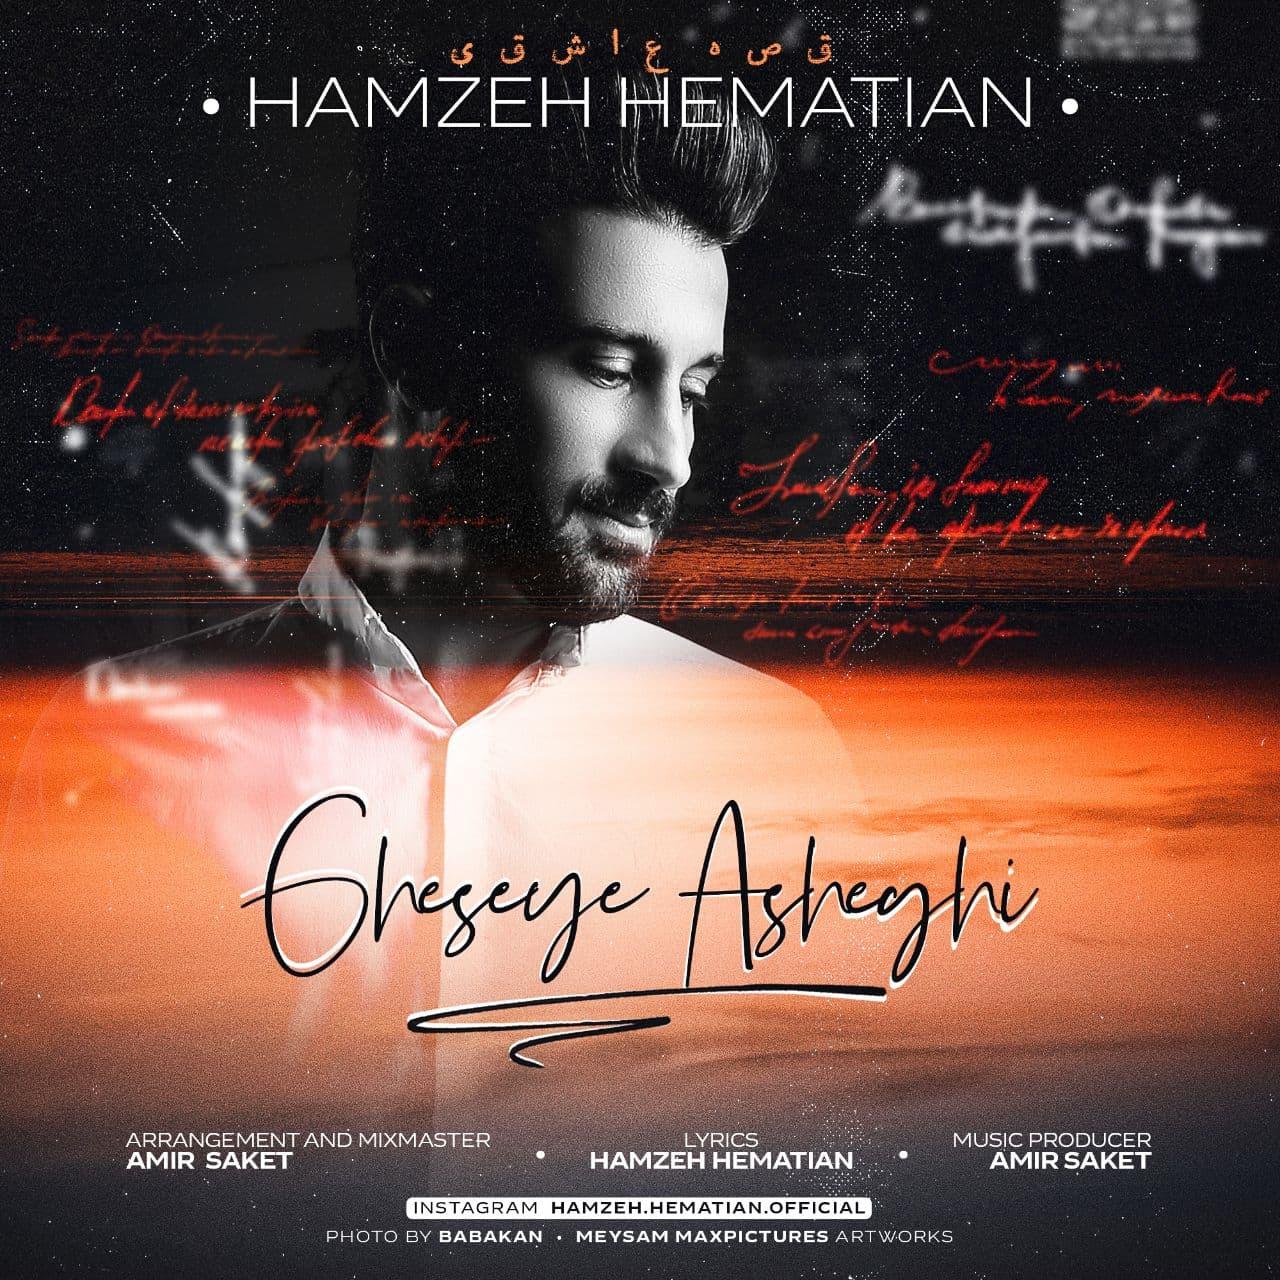 Hamzeh Hematian – Gheseye Asheghi